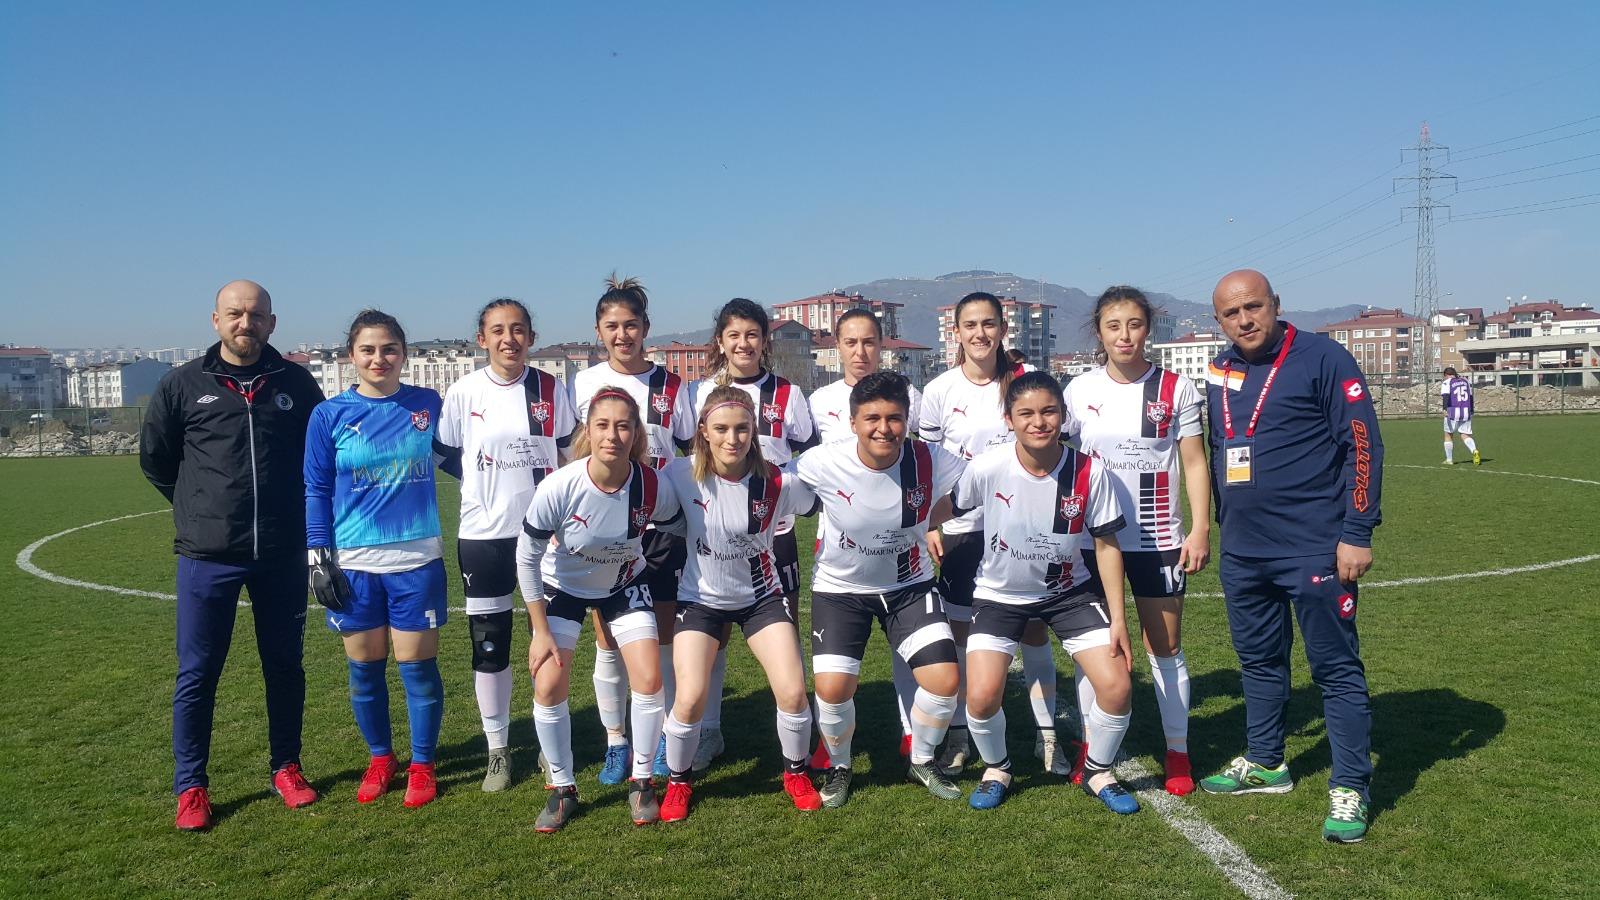 KIZLAR ORDU DERBİSİNİ FARKLI KAZANDI! 0-6